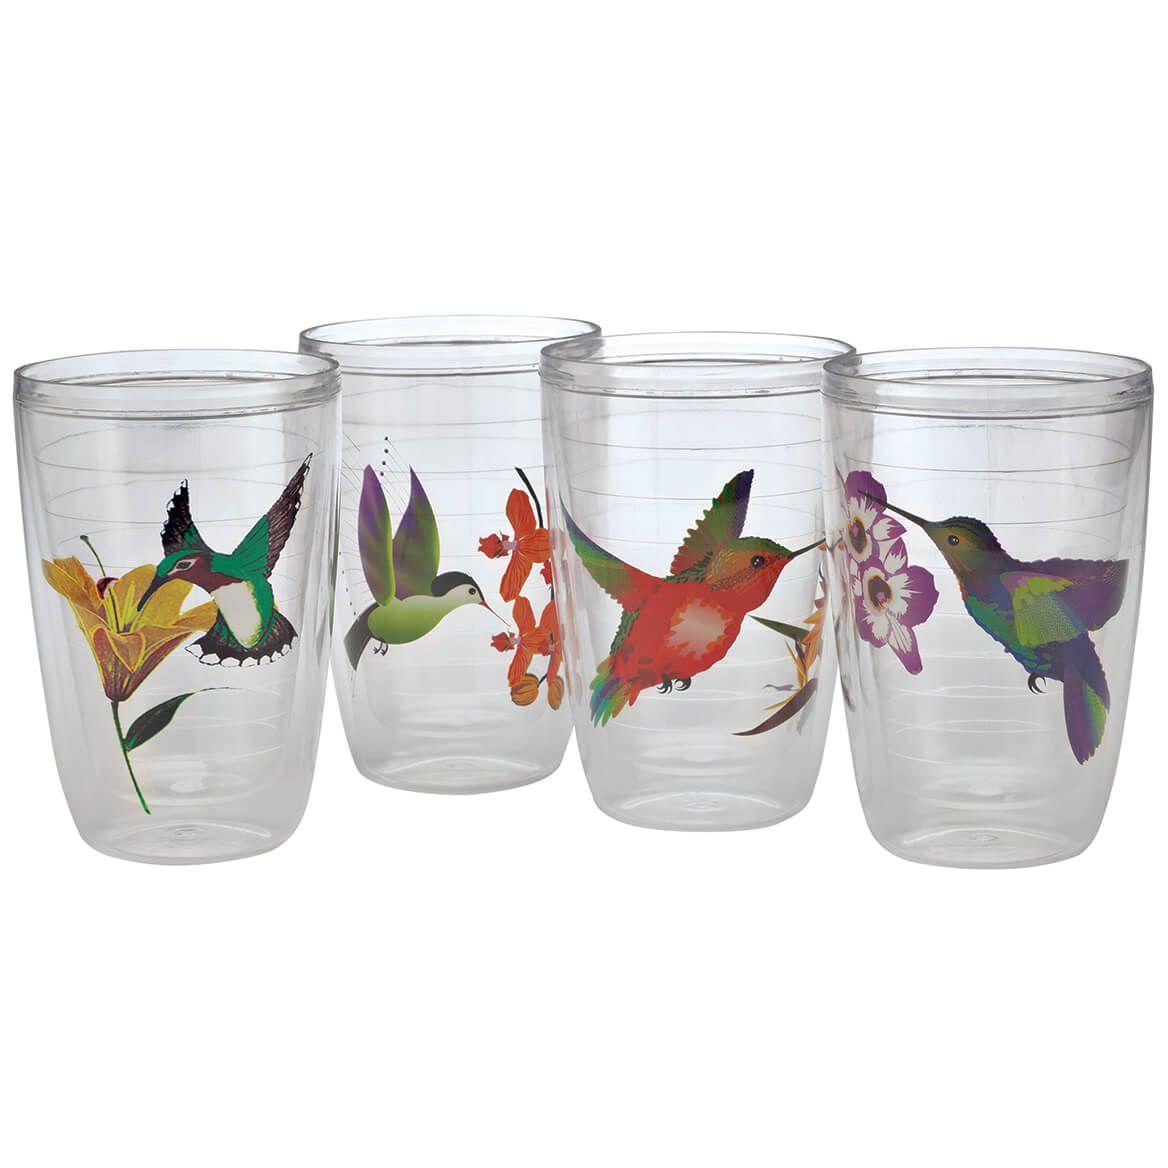 Insulated Hummingbird Tumblers, Set of 4-371116